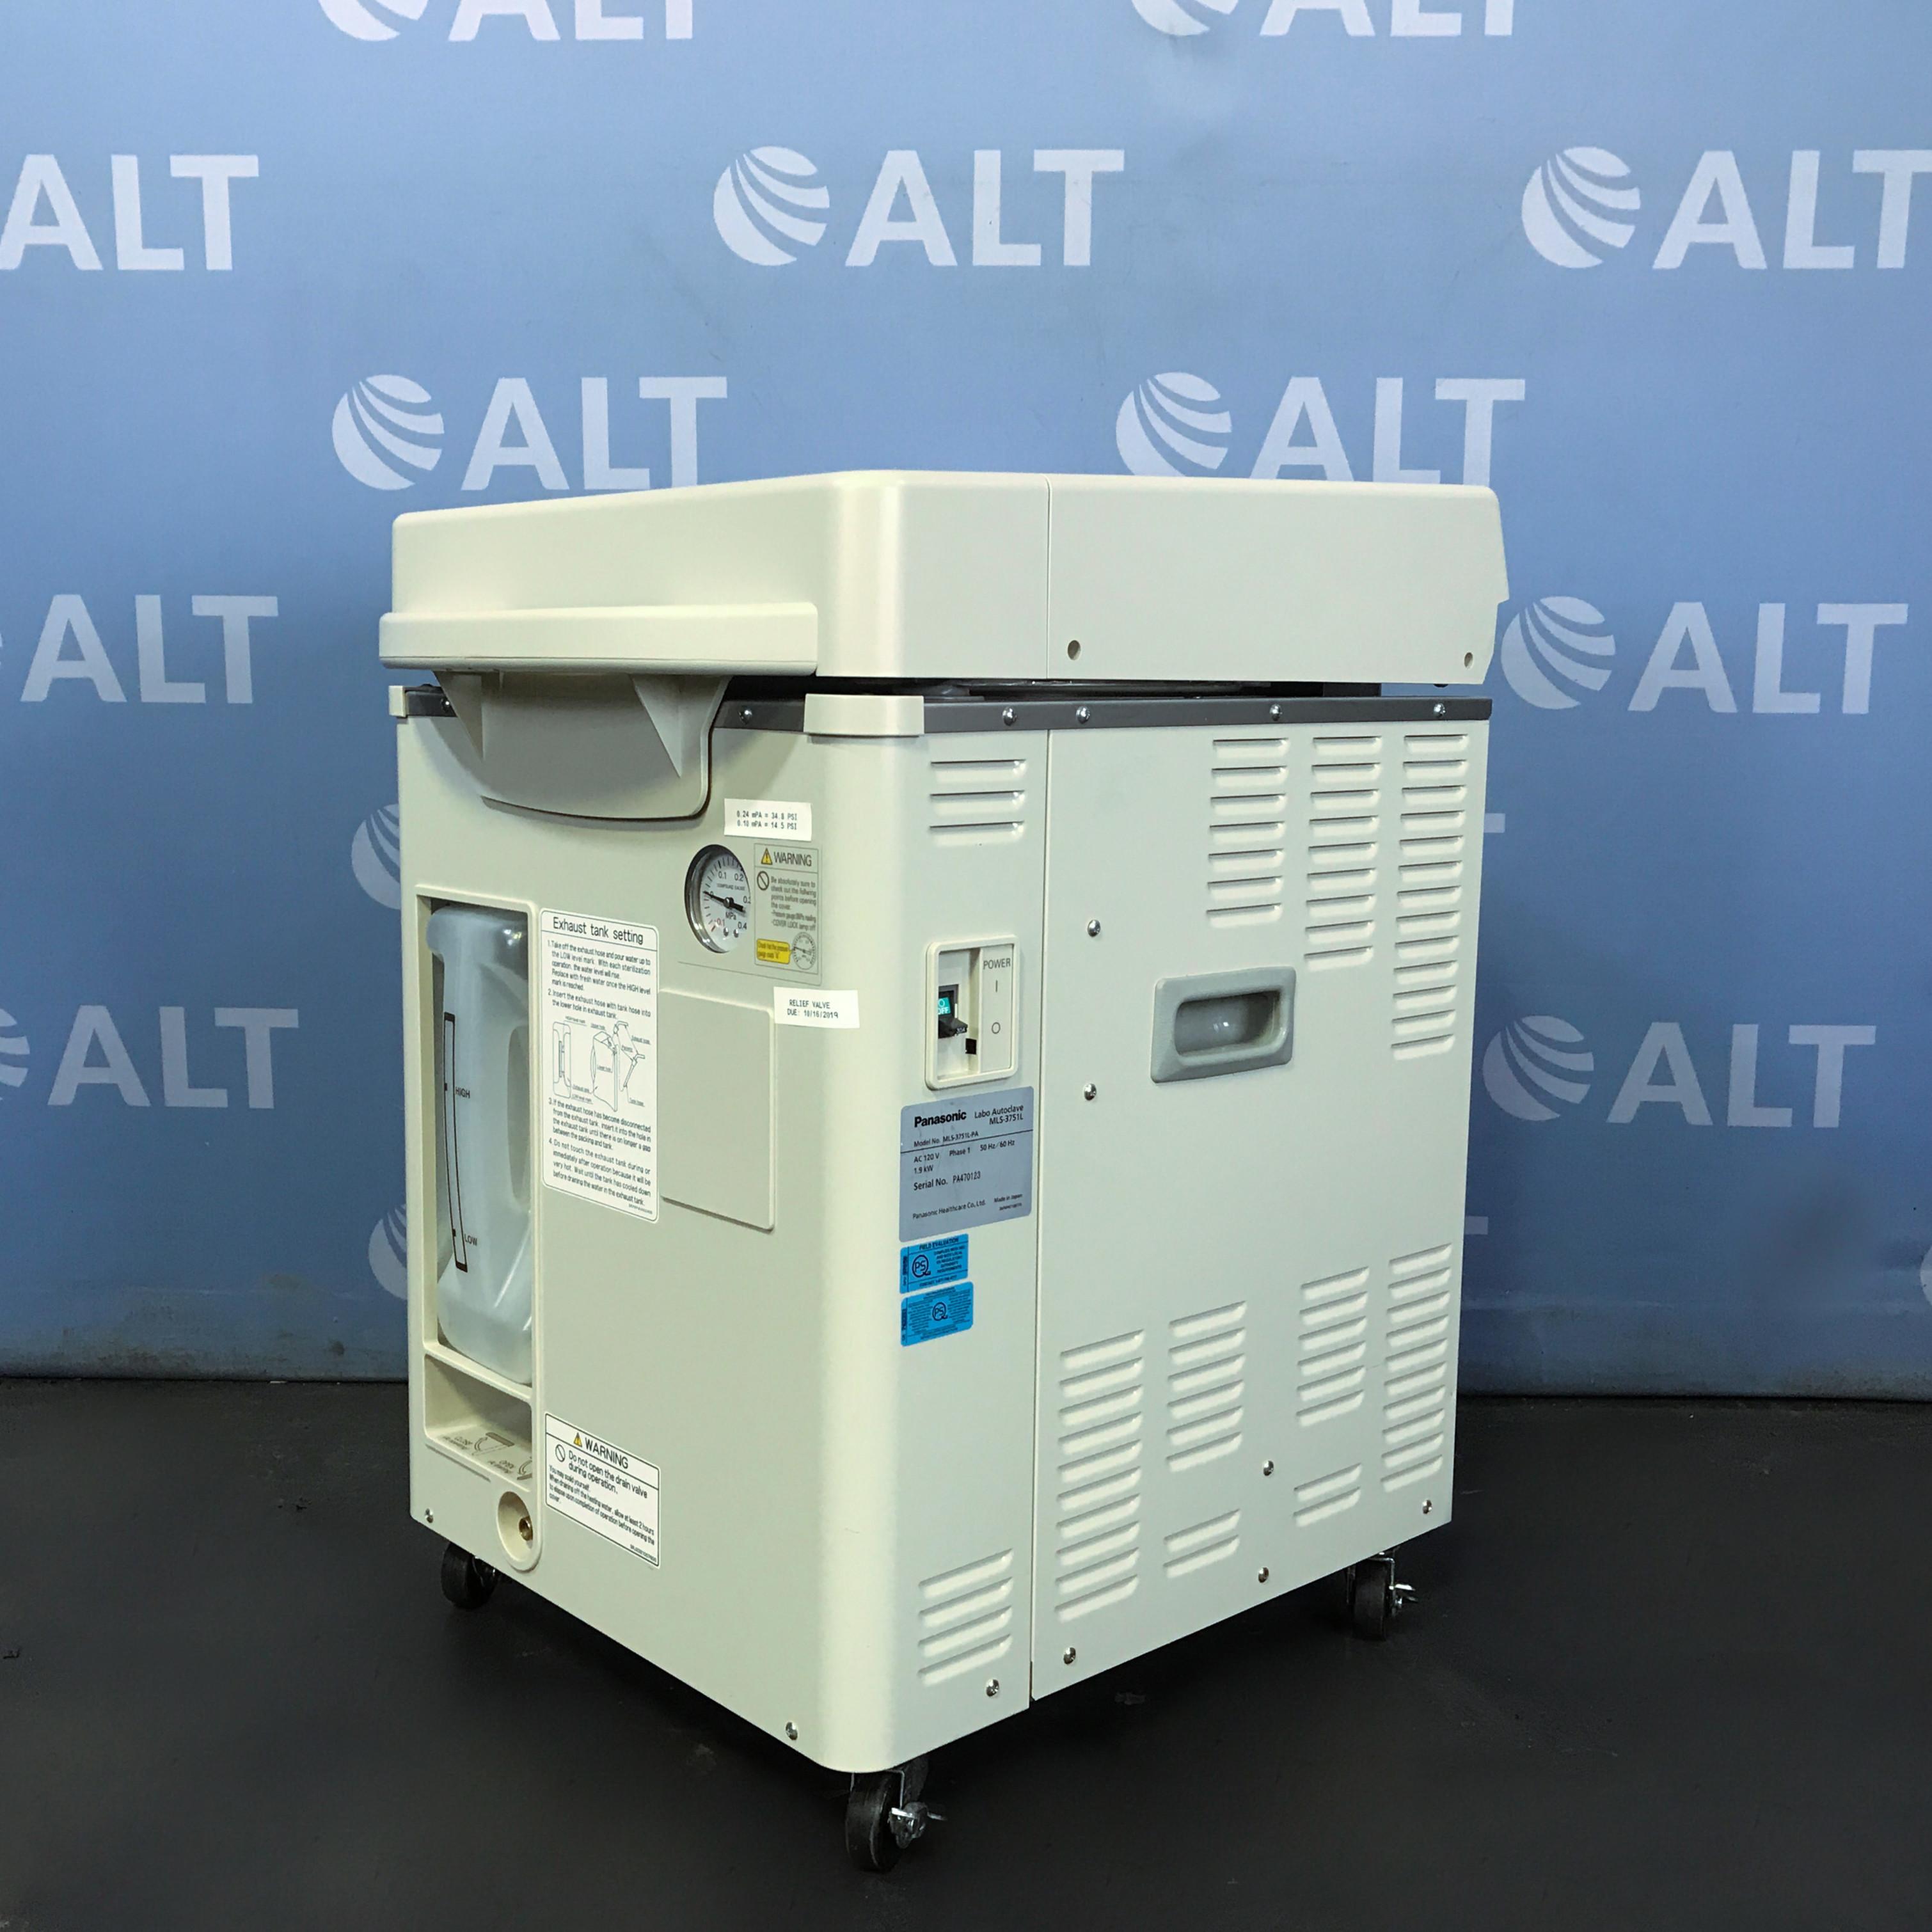 Panasonic MLS-3751L Compact Top-Loading Autoclave Image